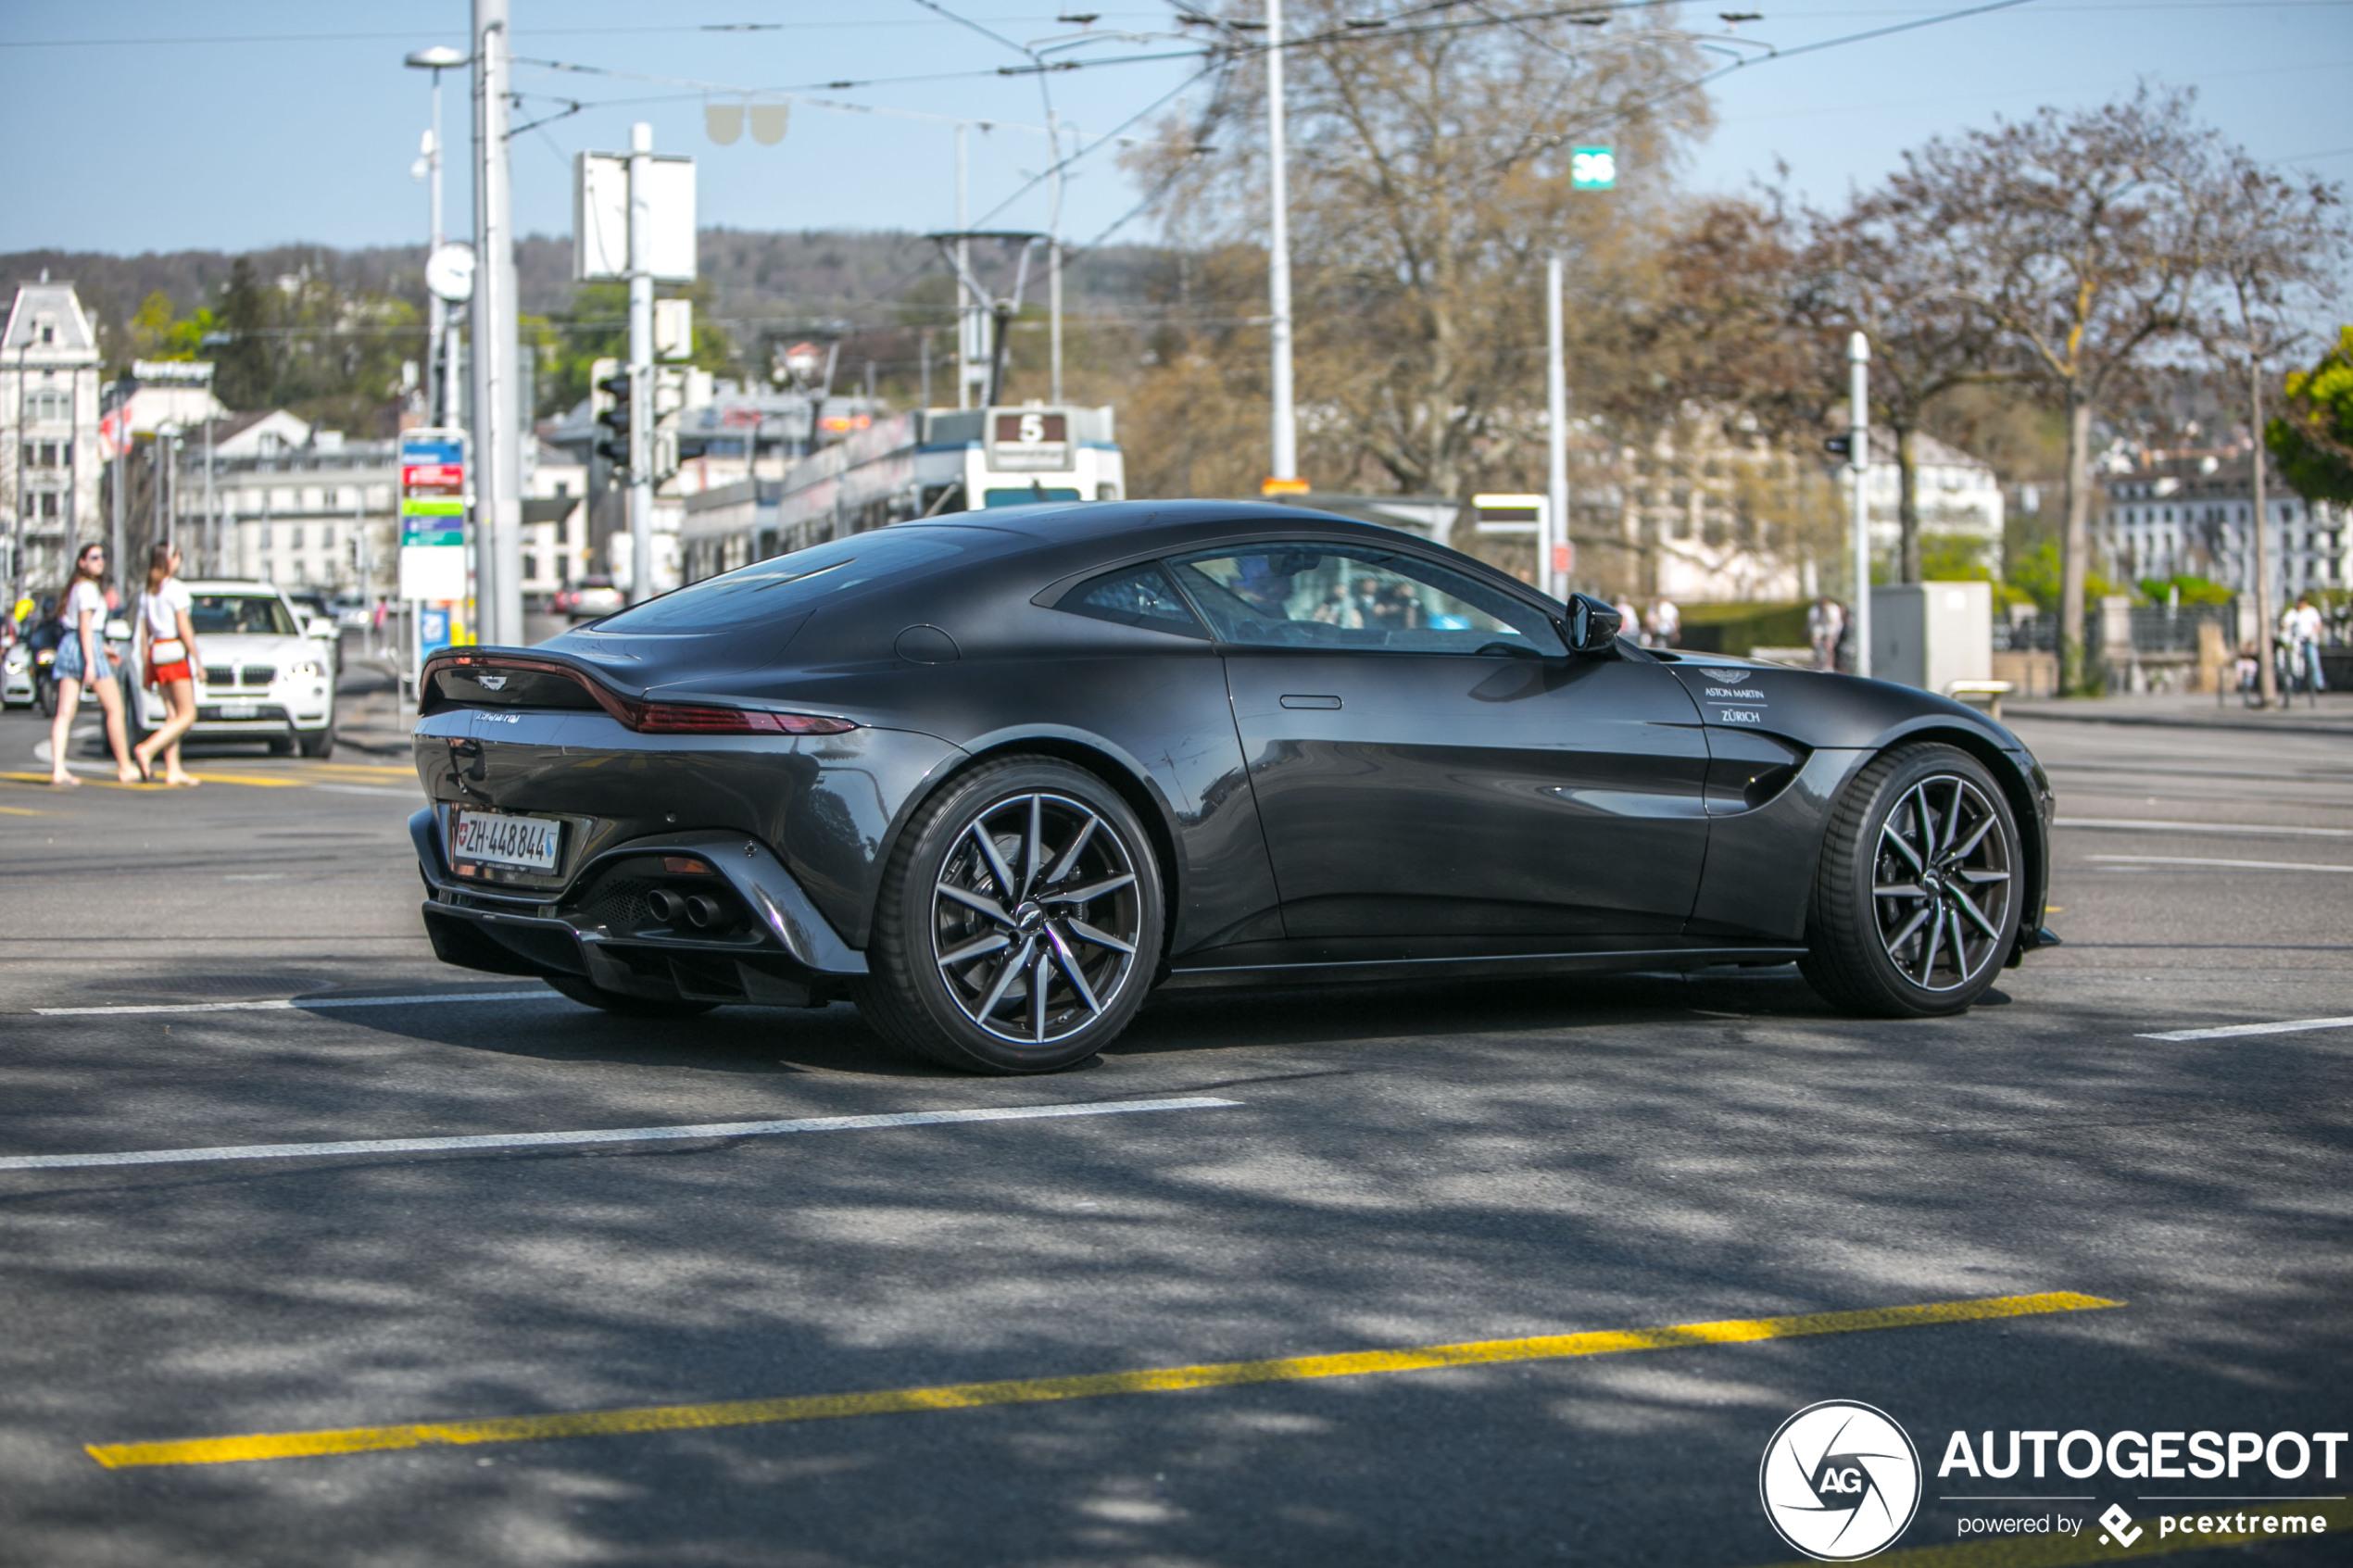 Aston Martin V8 Vantage 2018 13 April 2020 Autogespot